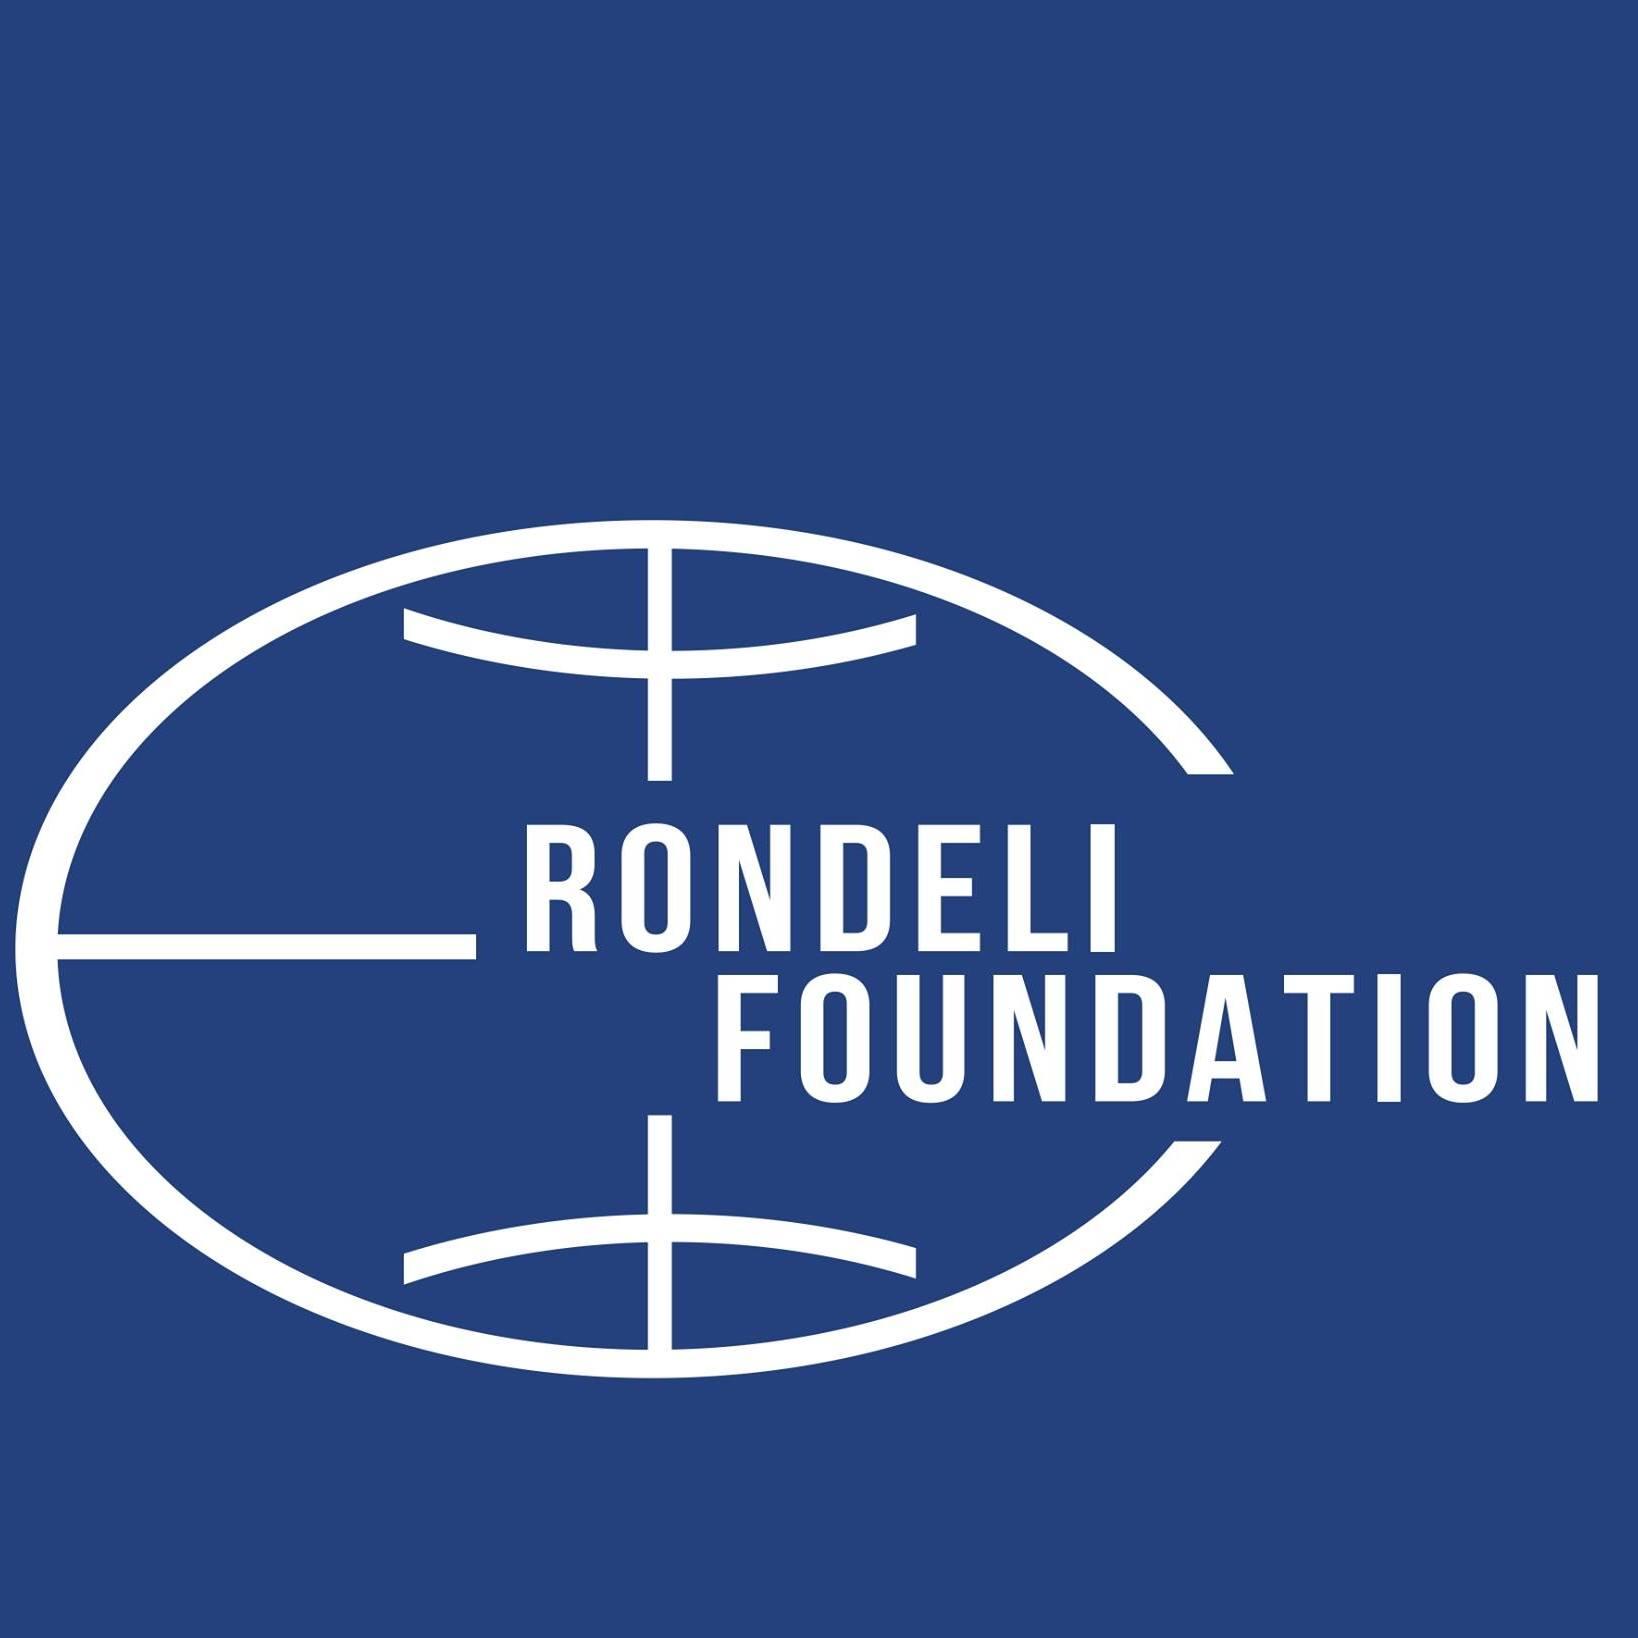 Rondeli Foundation – An analytical organization